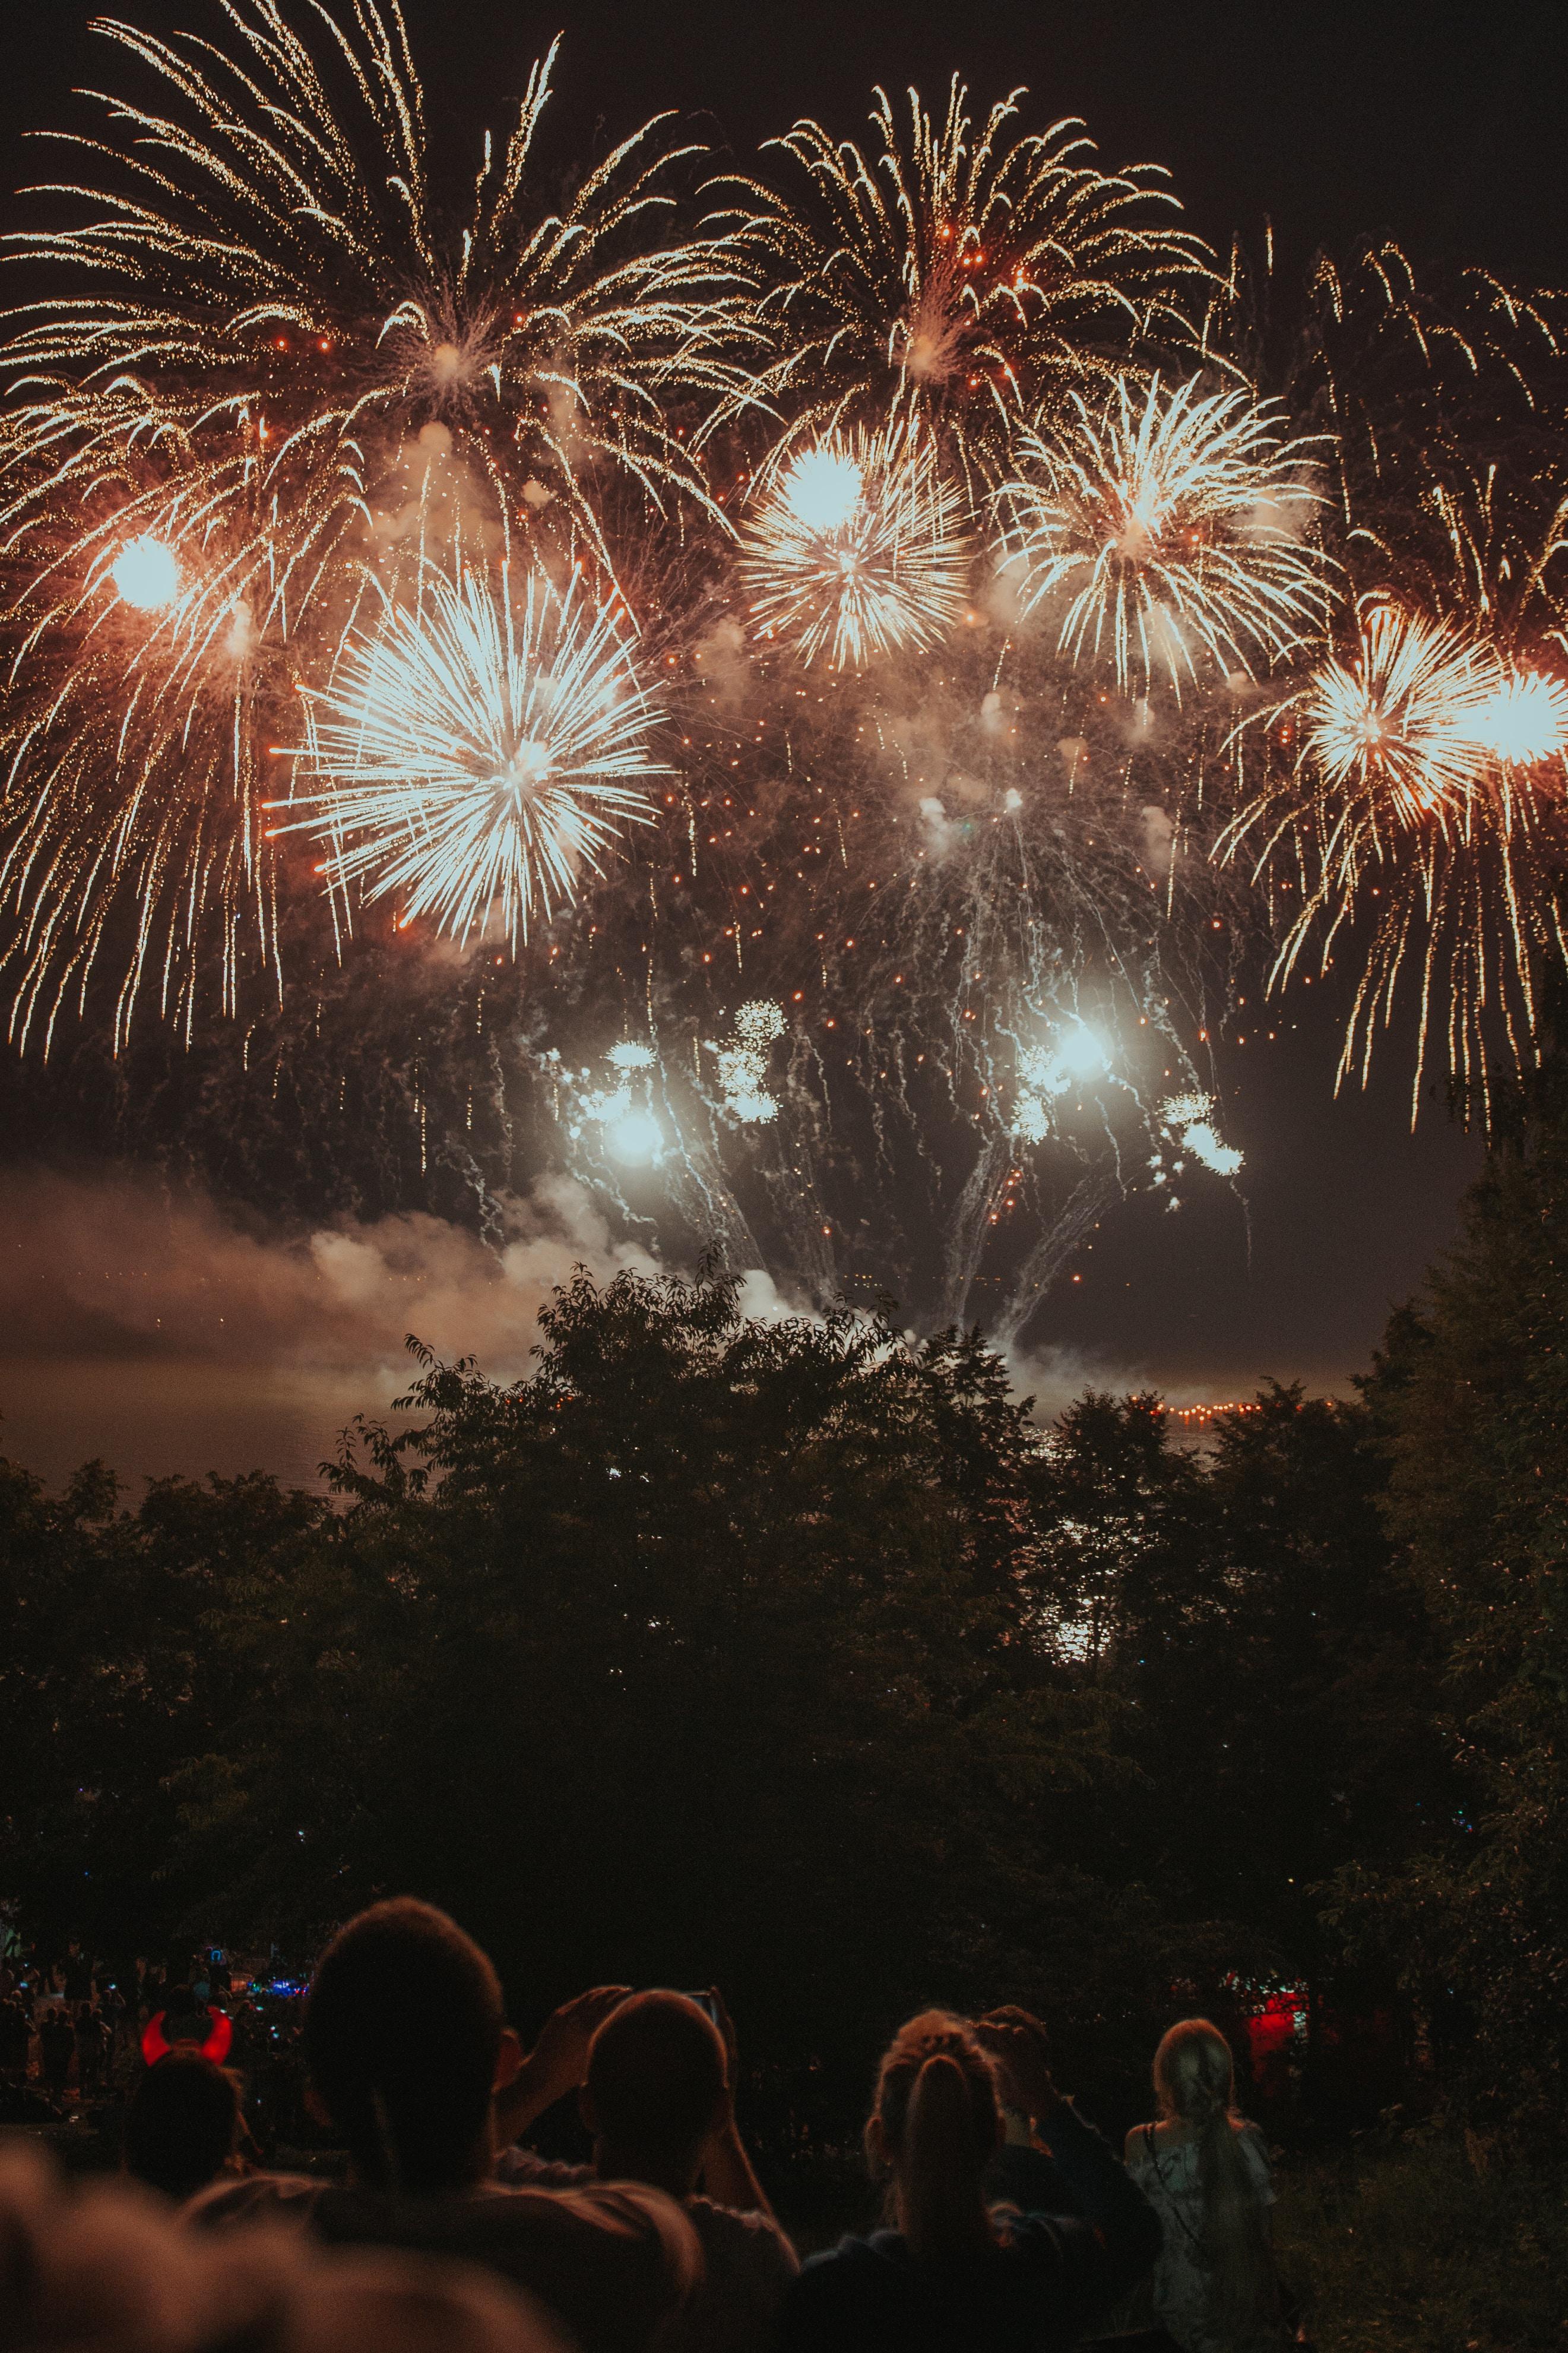 group of people watching fireworks display